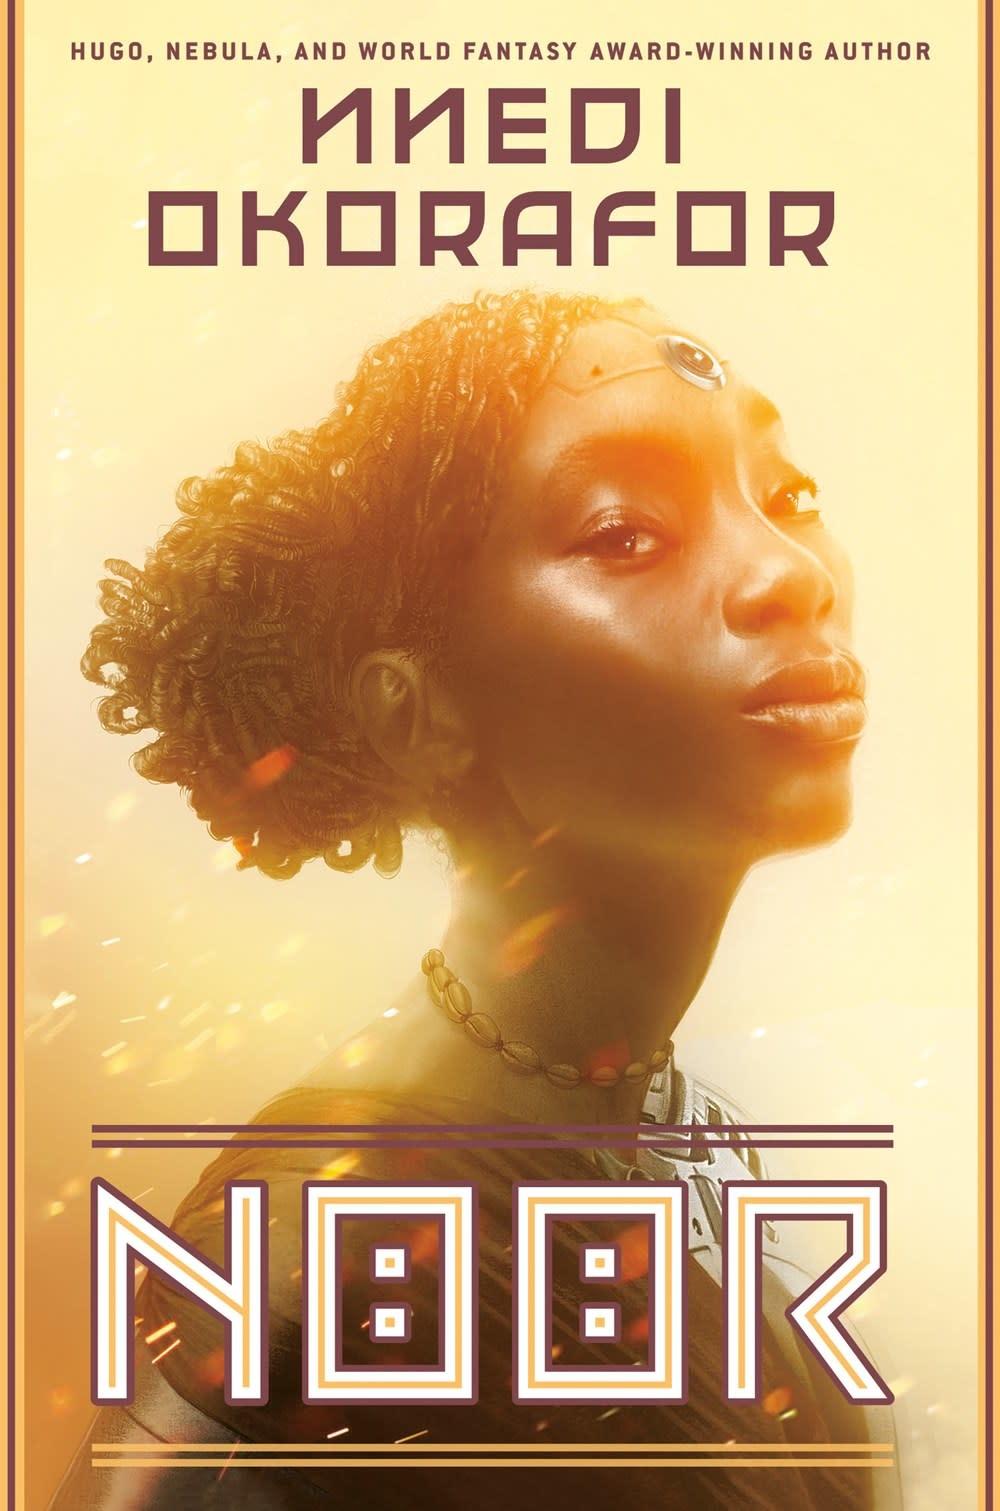 Noor: A novel